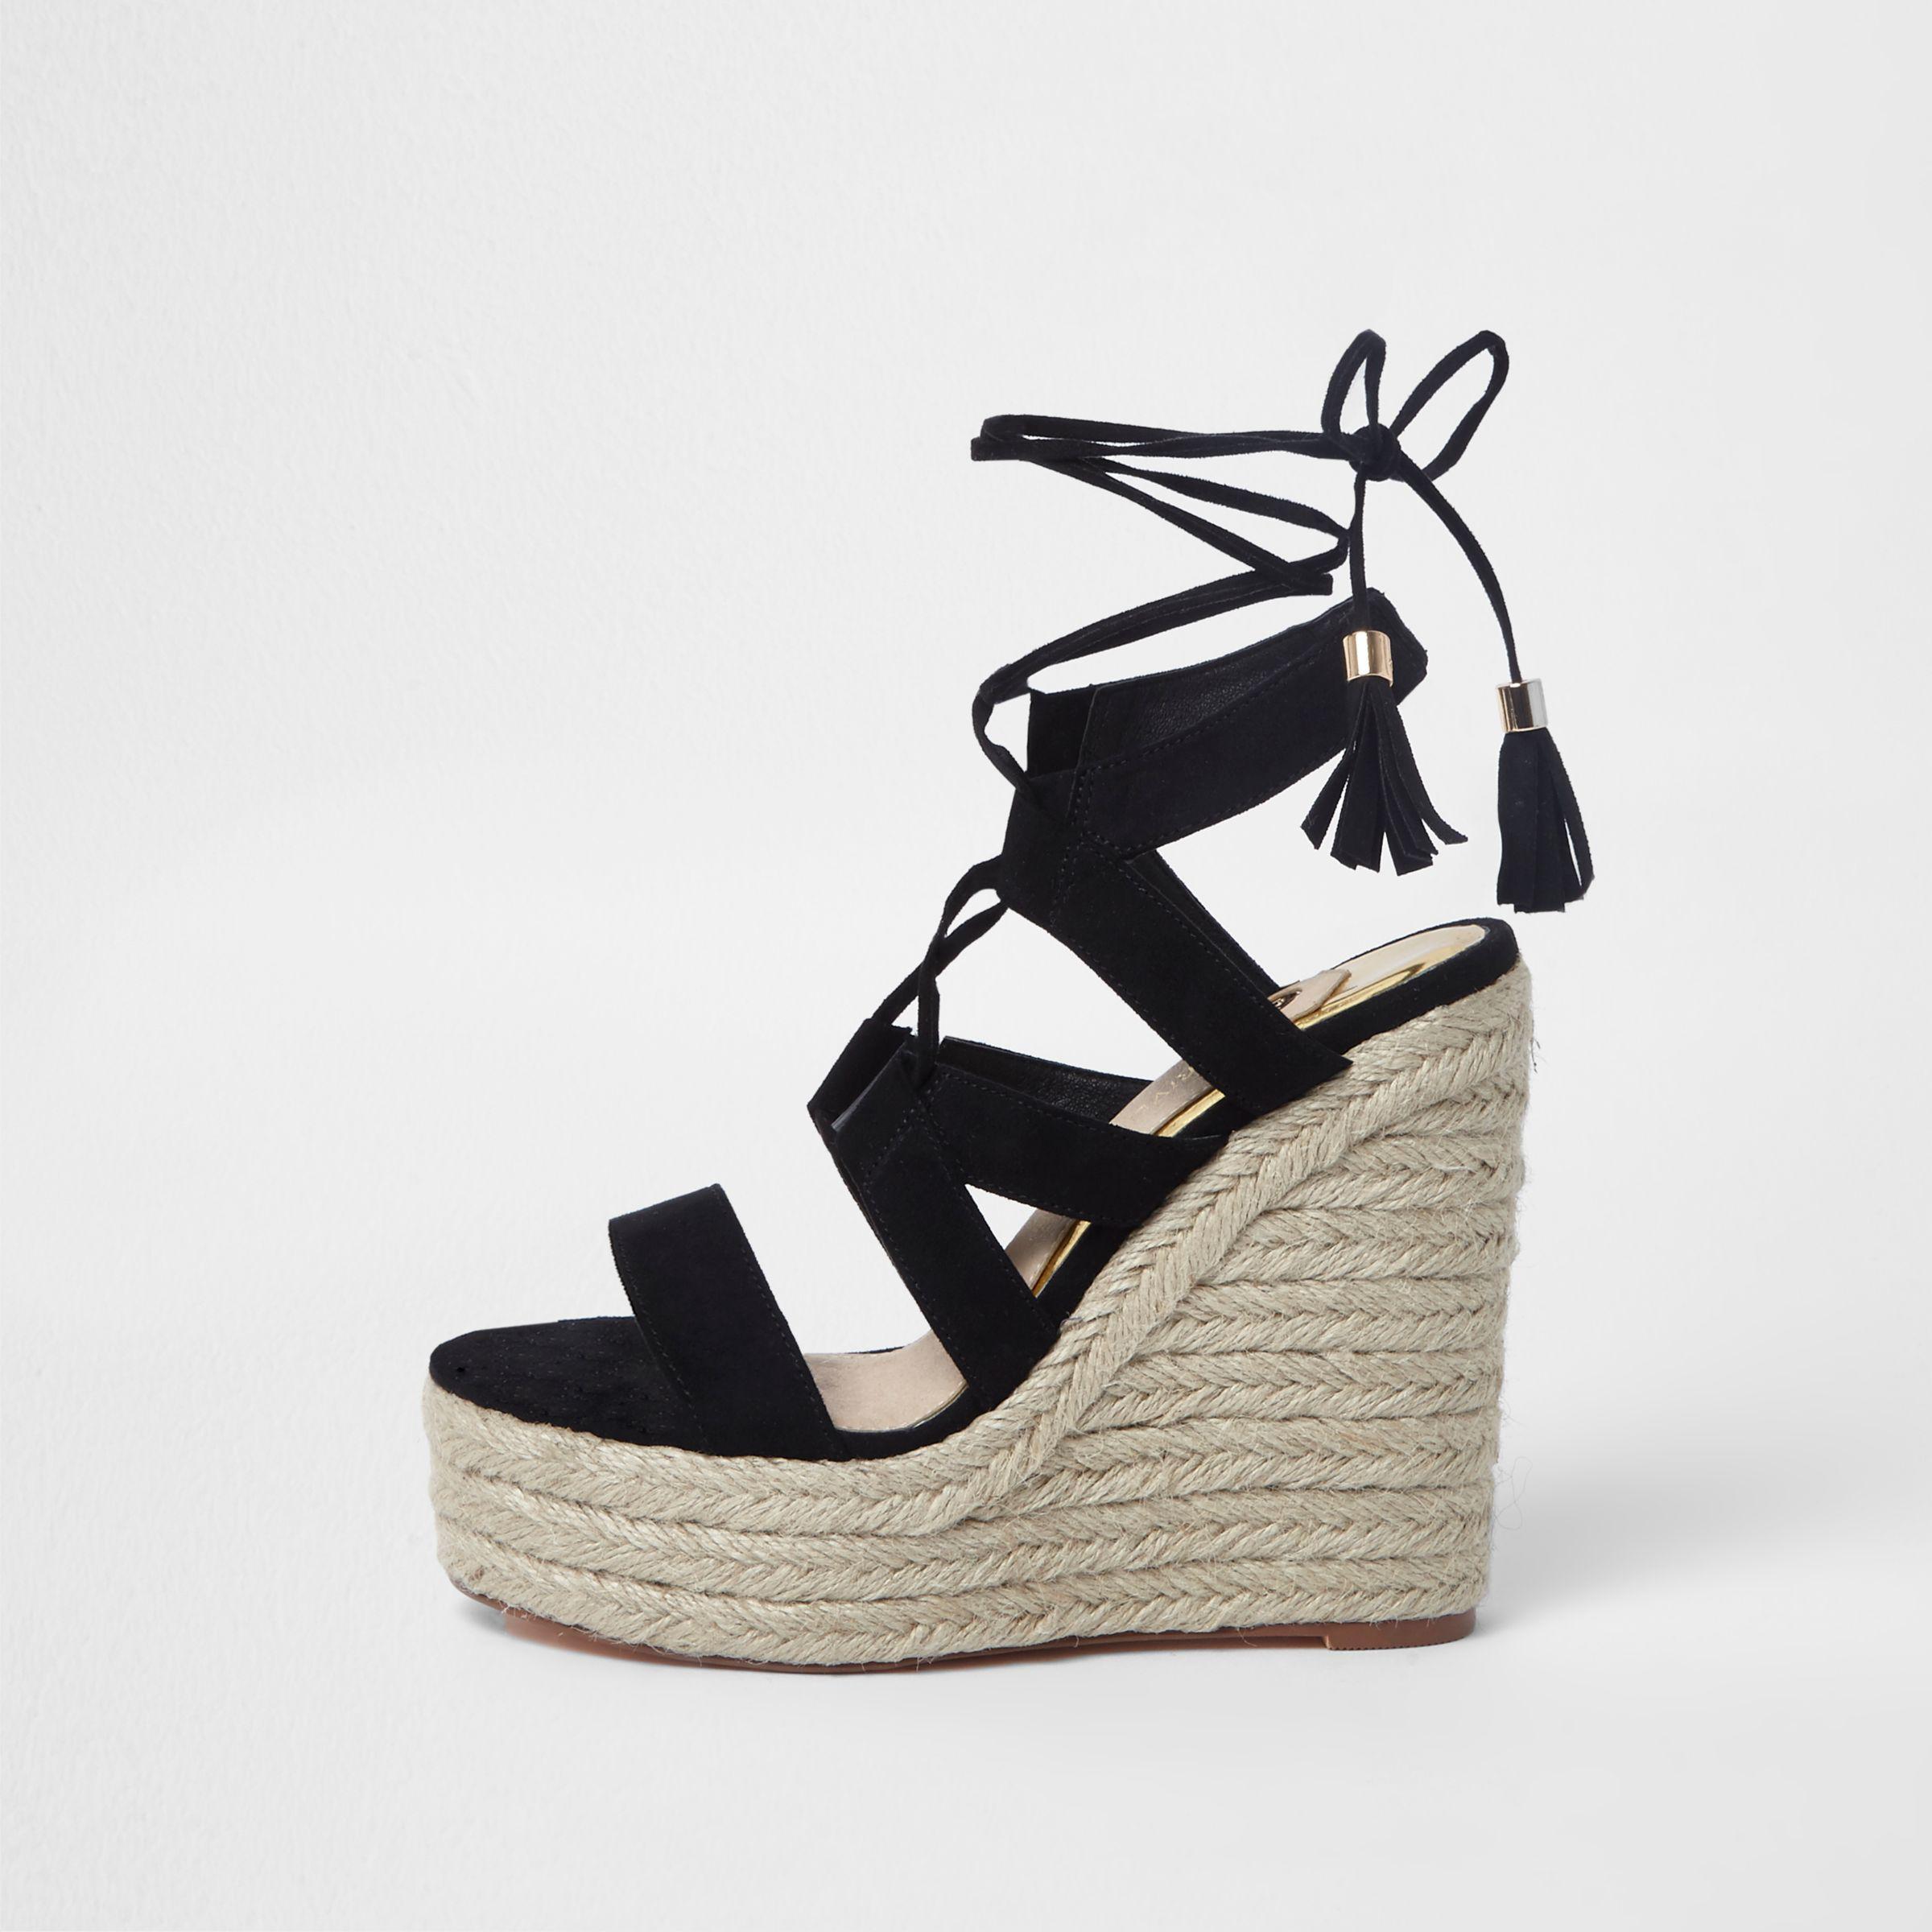 cc4579feb3e Lyst - River Island Black Lace-up Espadrille Wedges Sandals in Black